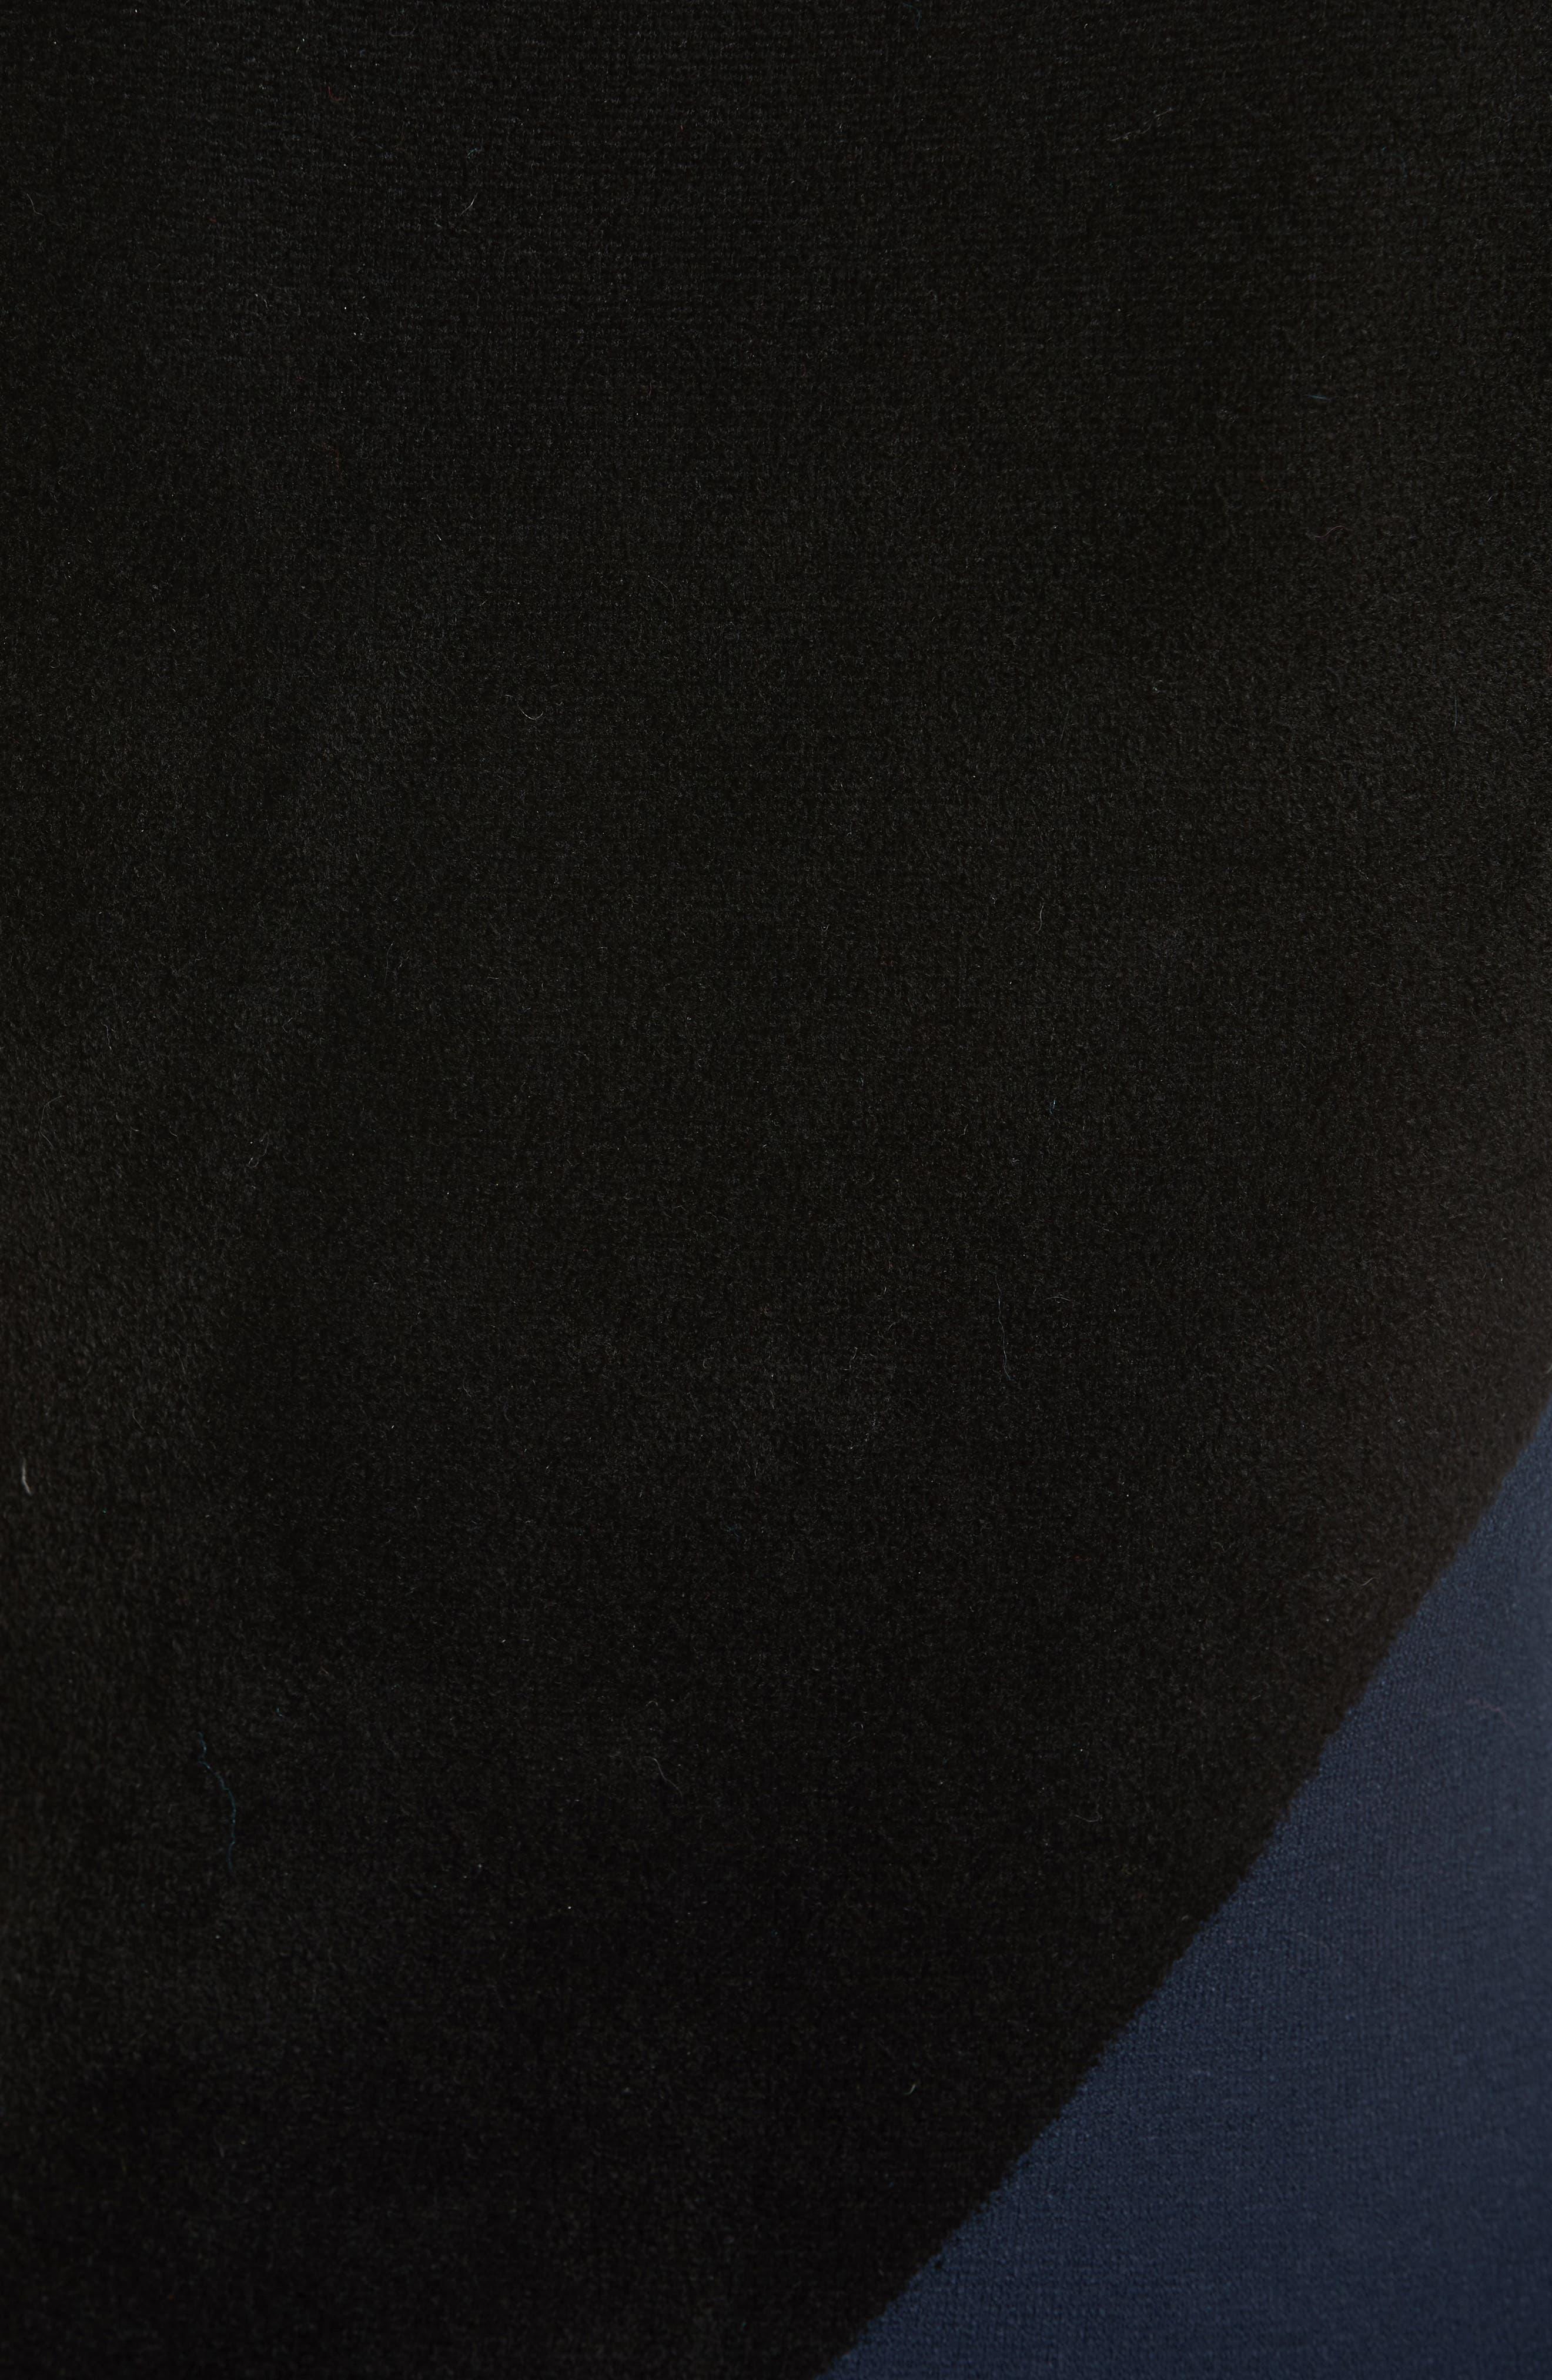 Body-Con Knit Maxi Dress,                             Alternate thumbnail 5, color,                             Black/ Deep Violet